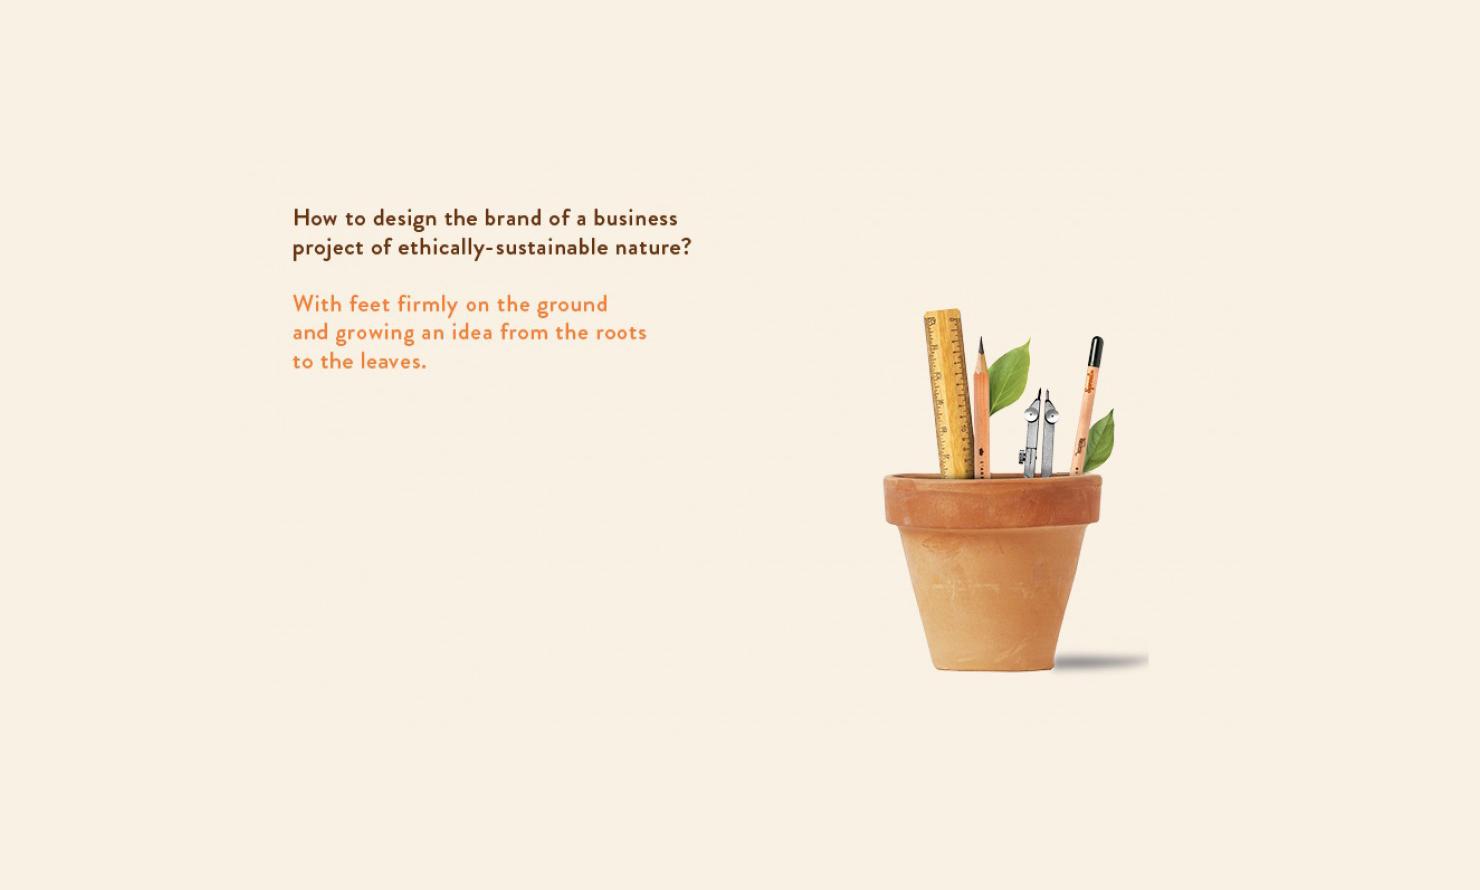 https://kubelibre.com/uploads/Slider-work-tutti-clienti/manital-vistaterra-l-agriparco-che-abbraccia-il-castello-brand-identity-brand-strategy-2.jpg